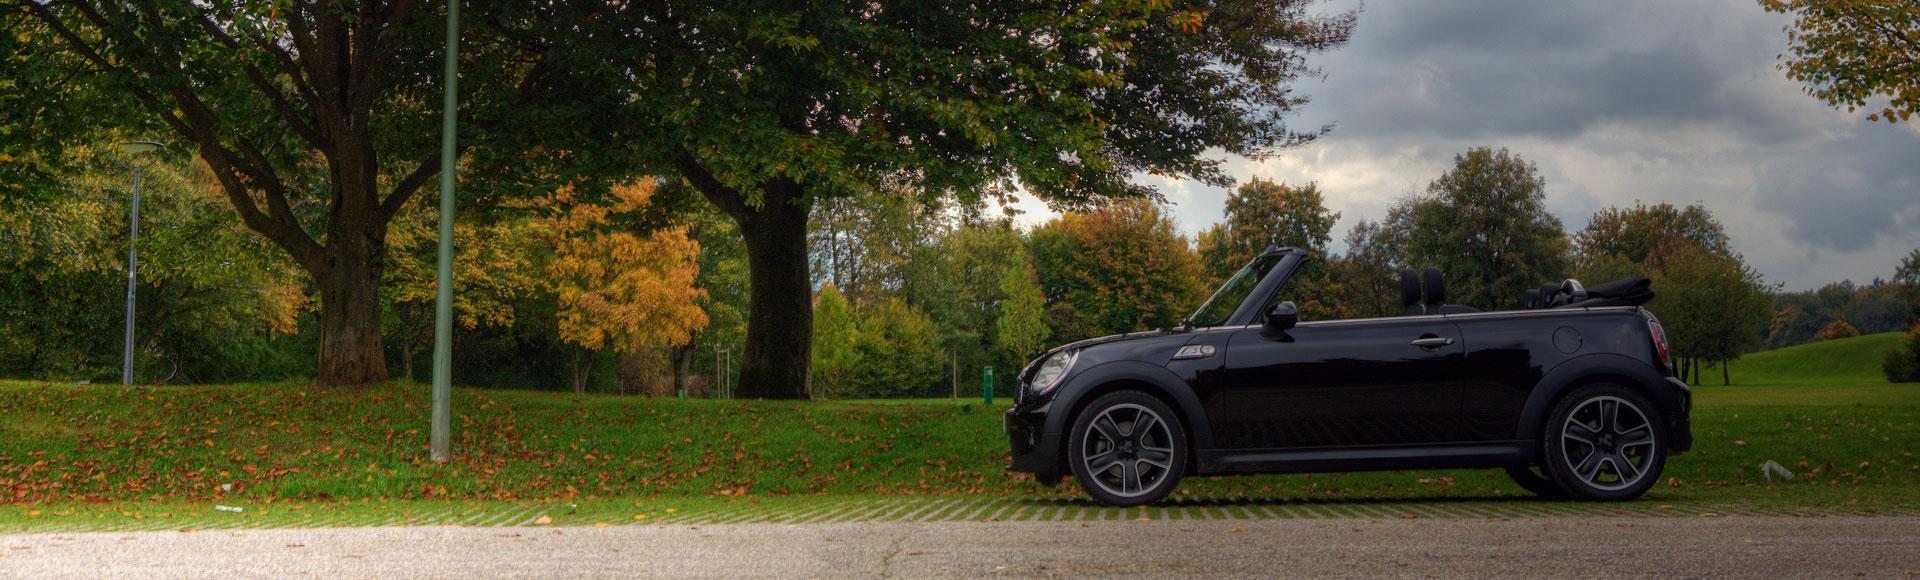 Mini Cooper Cabrio offen Herbst